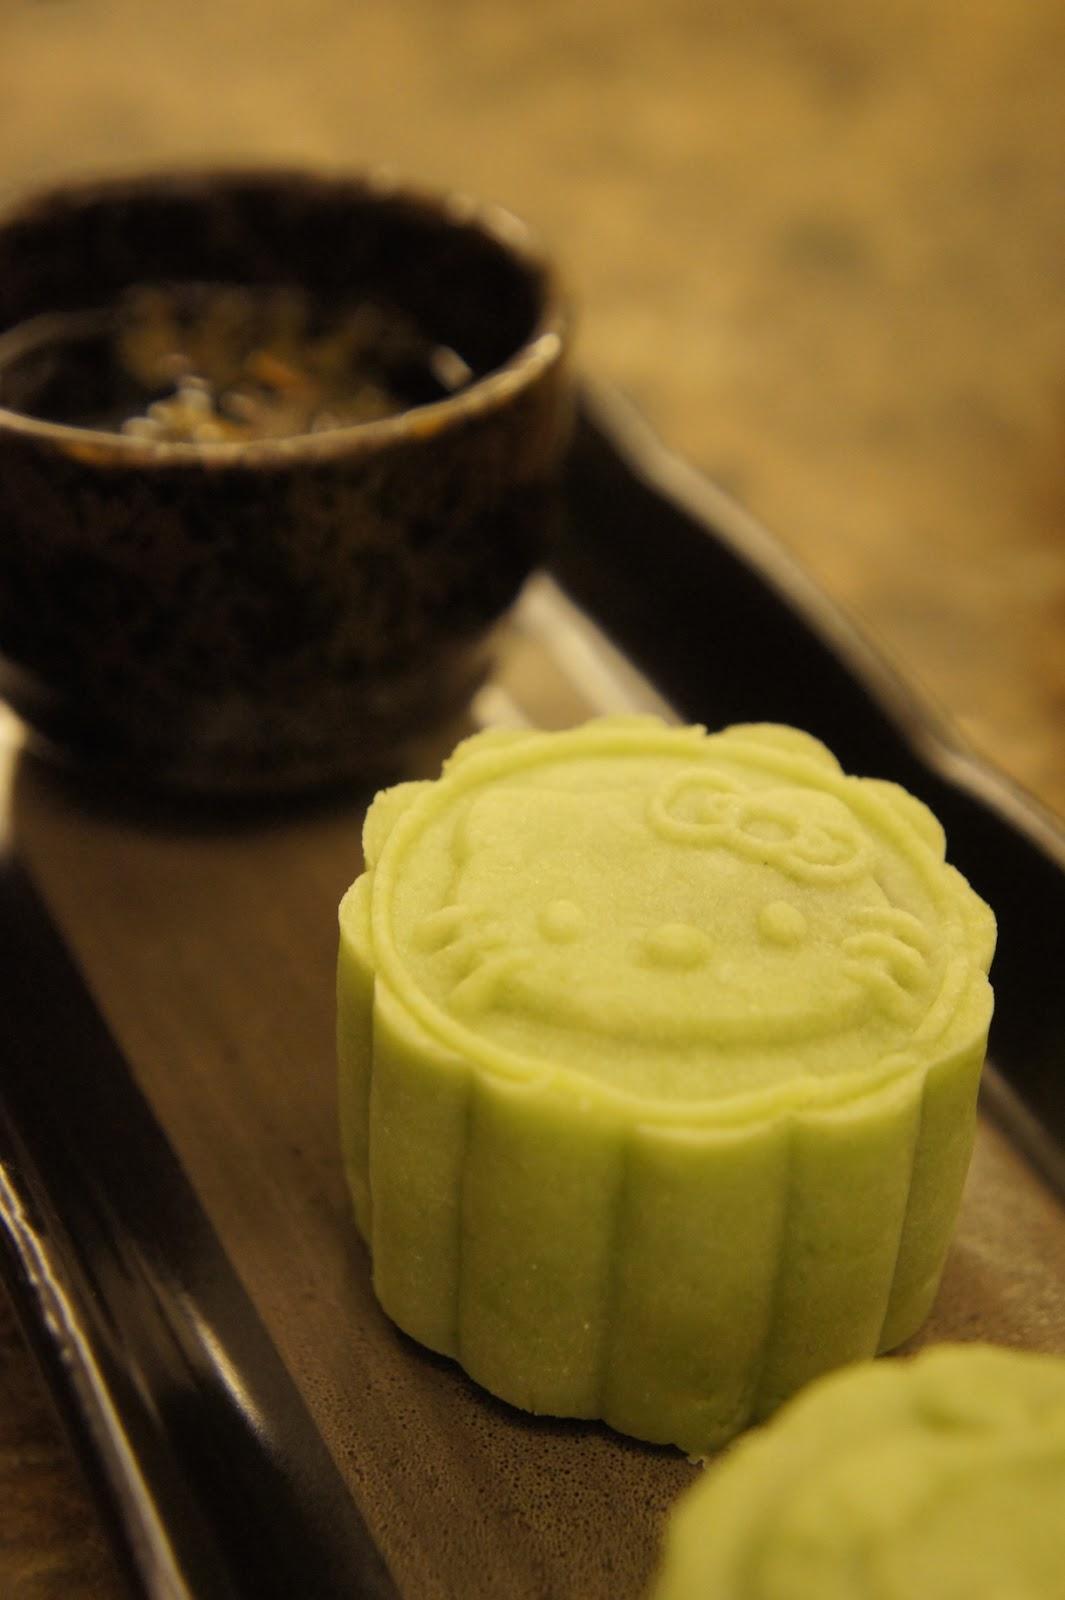 Green Tea Cakes Cake The Best Green